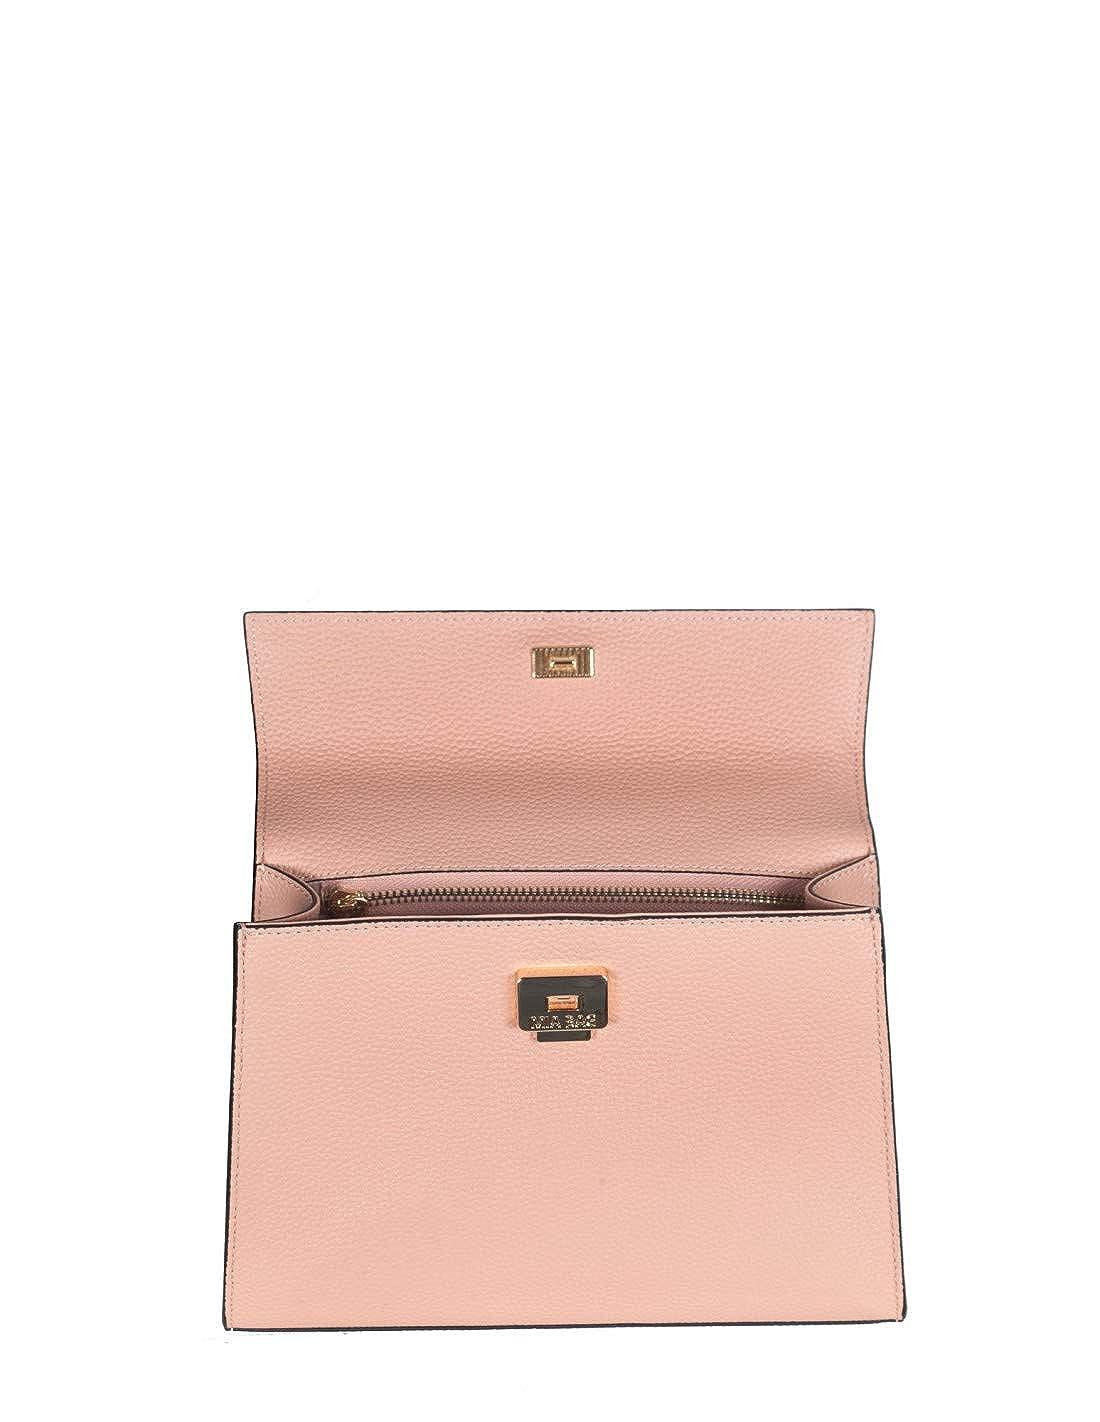 Small bag woman Powder 19111 Doctor bag Primavera//Estate 2019 Mia Bag